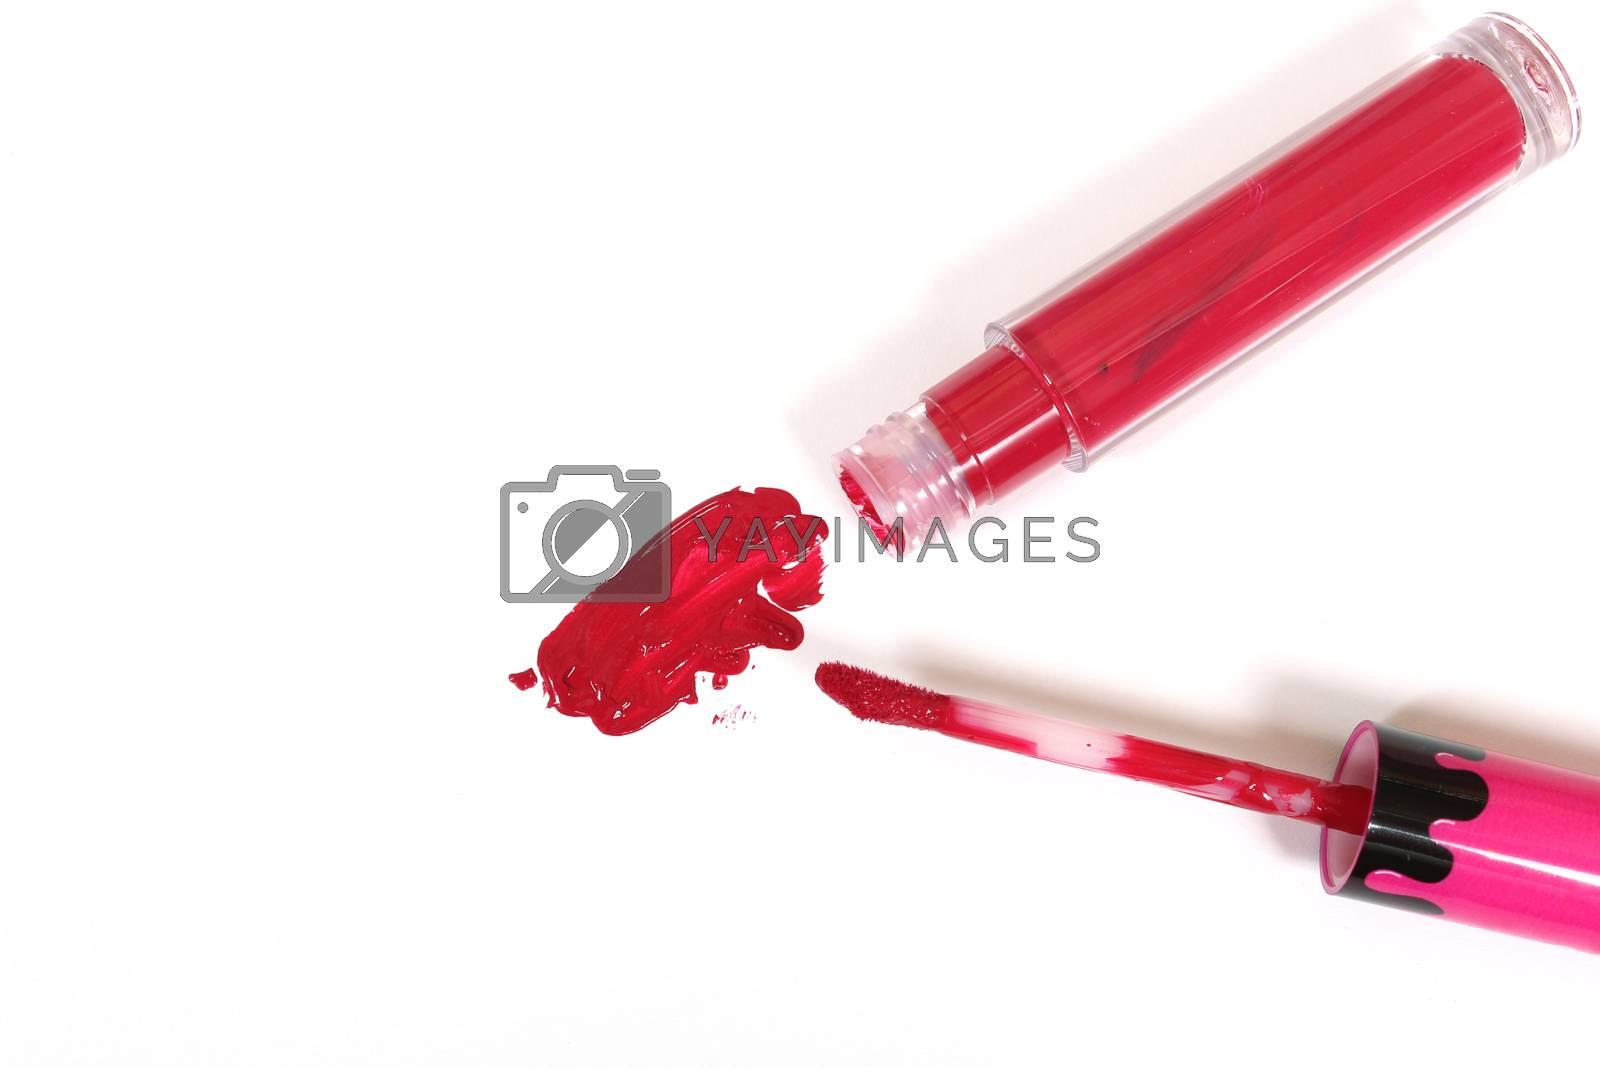 Red Liquid Lipstick on White Background